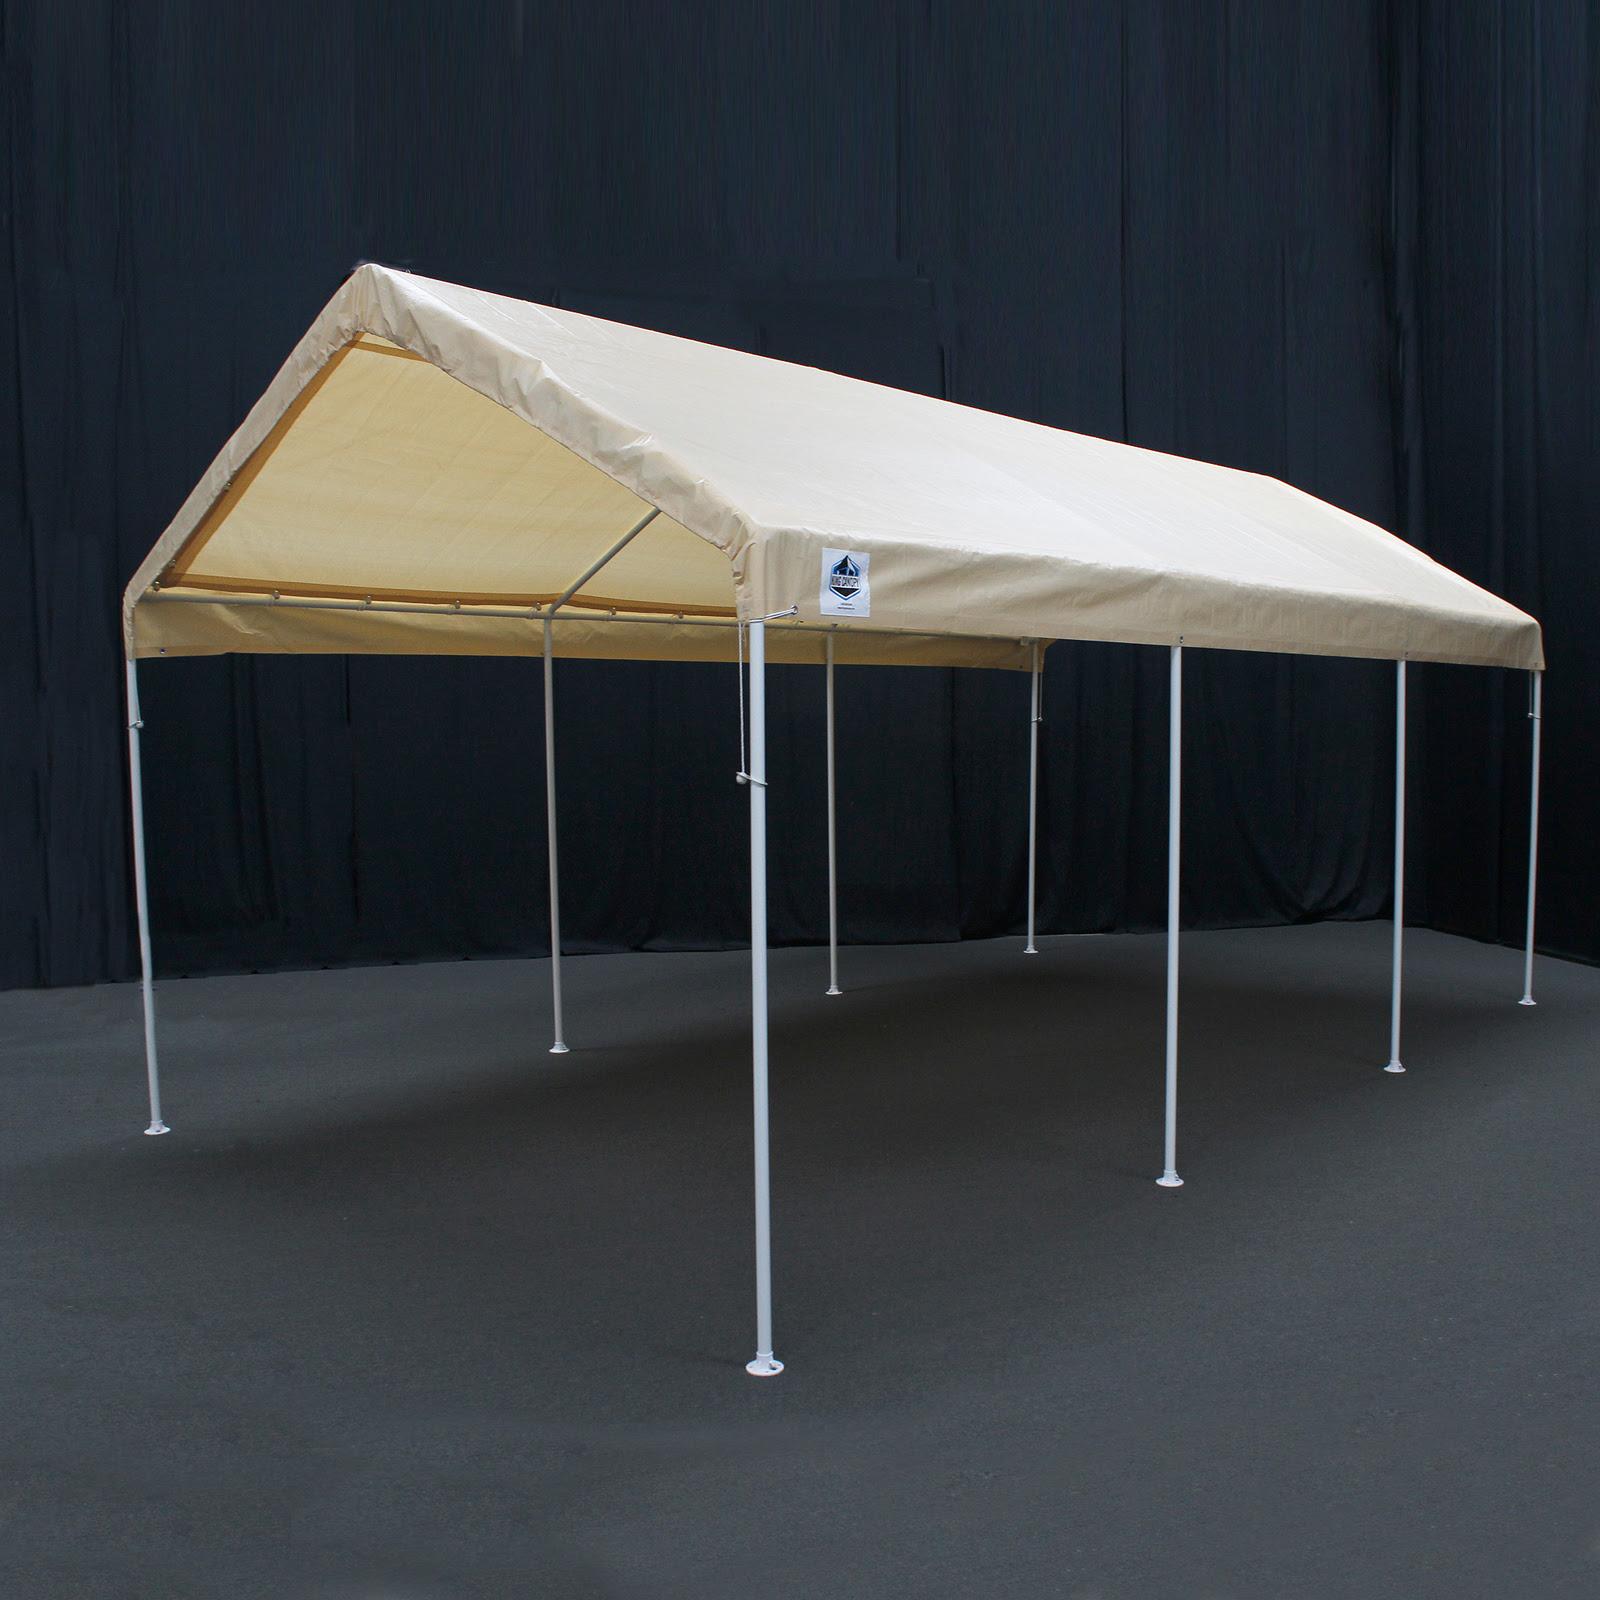 King Canopy Universal Canopy 10x20 8-Leg - Tan